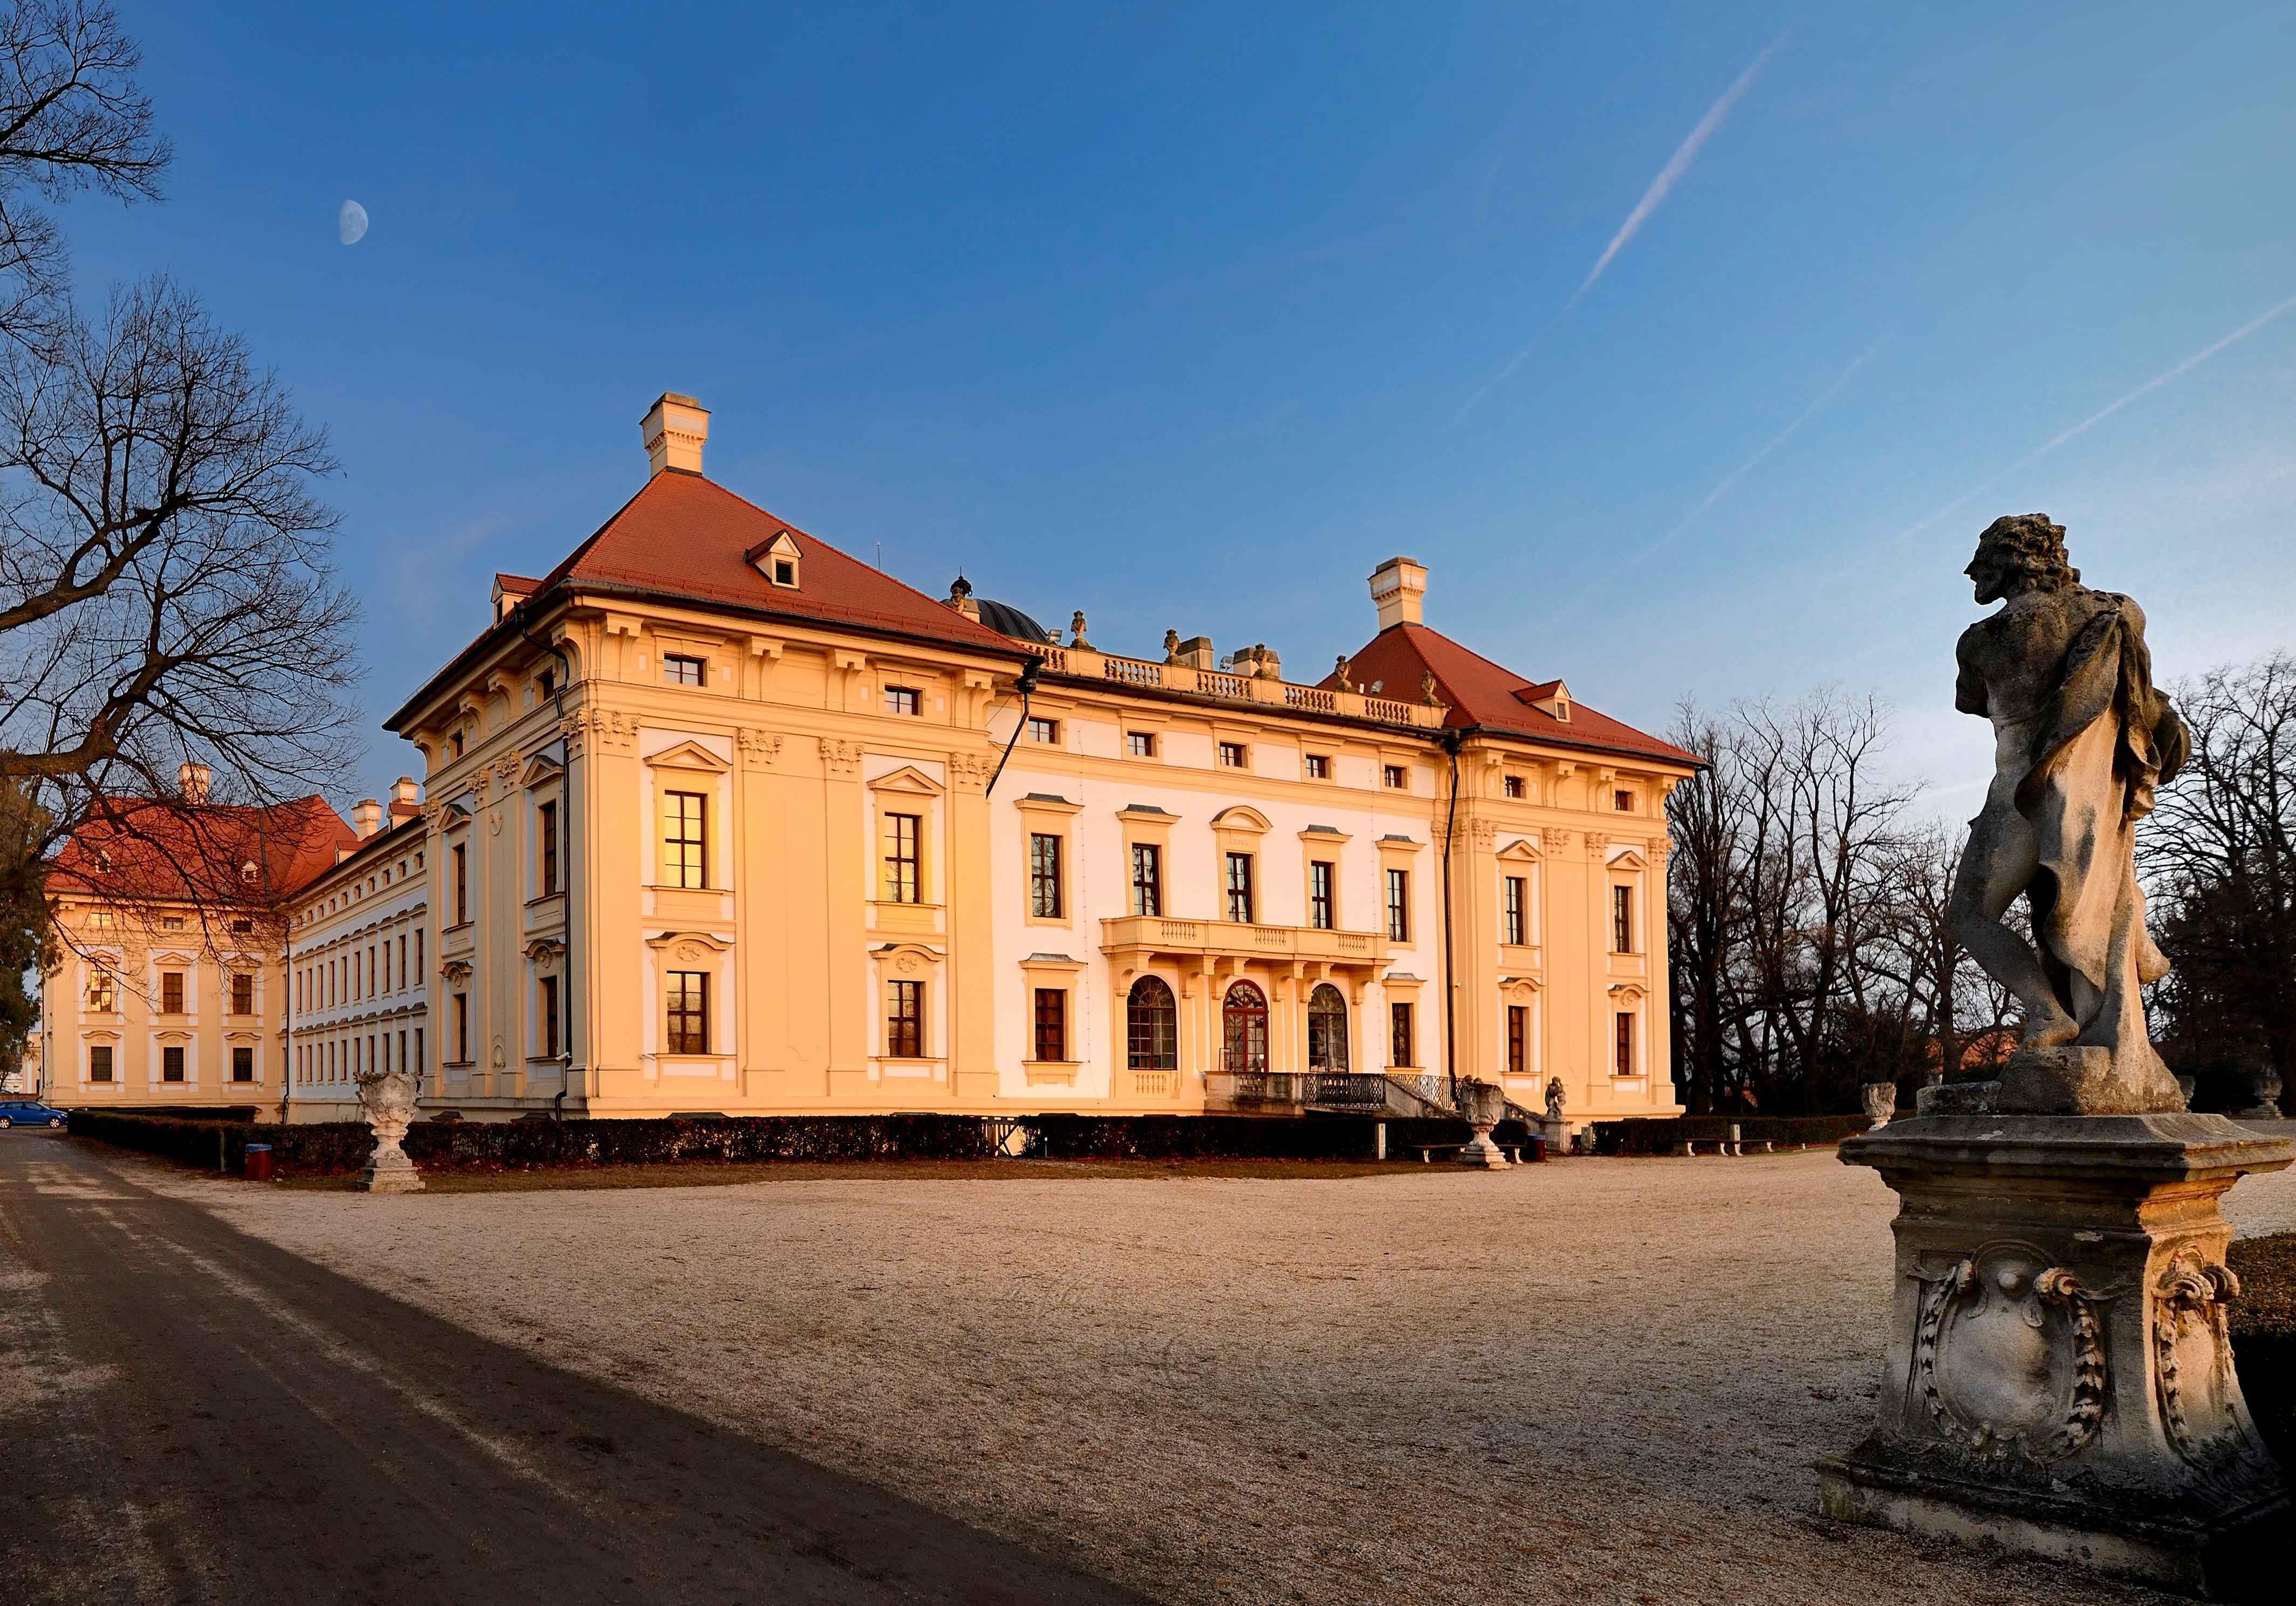 Slavkov – Austerlitz Chateau